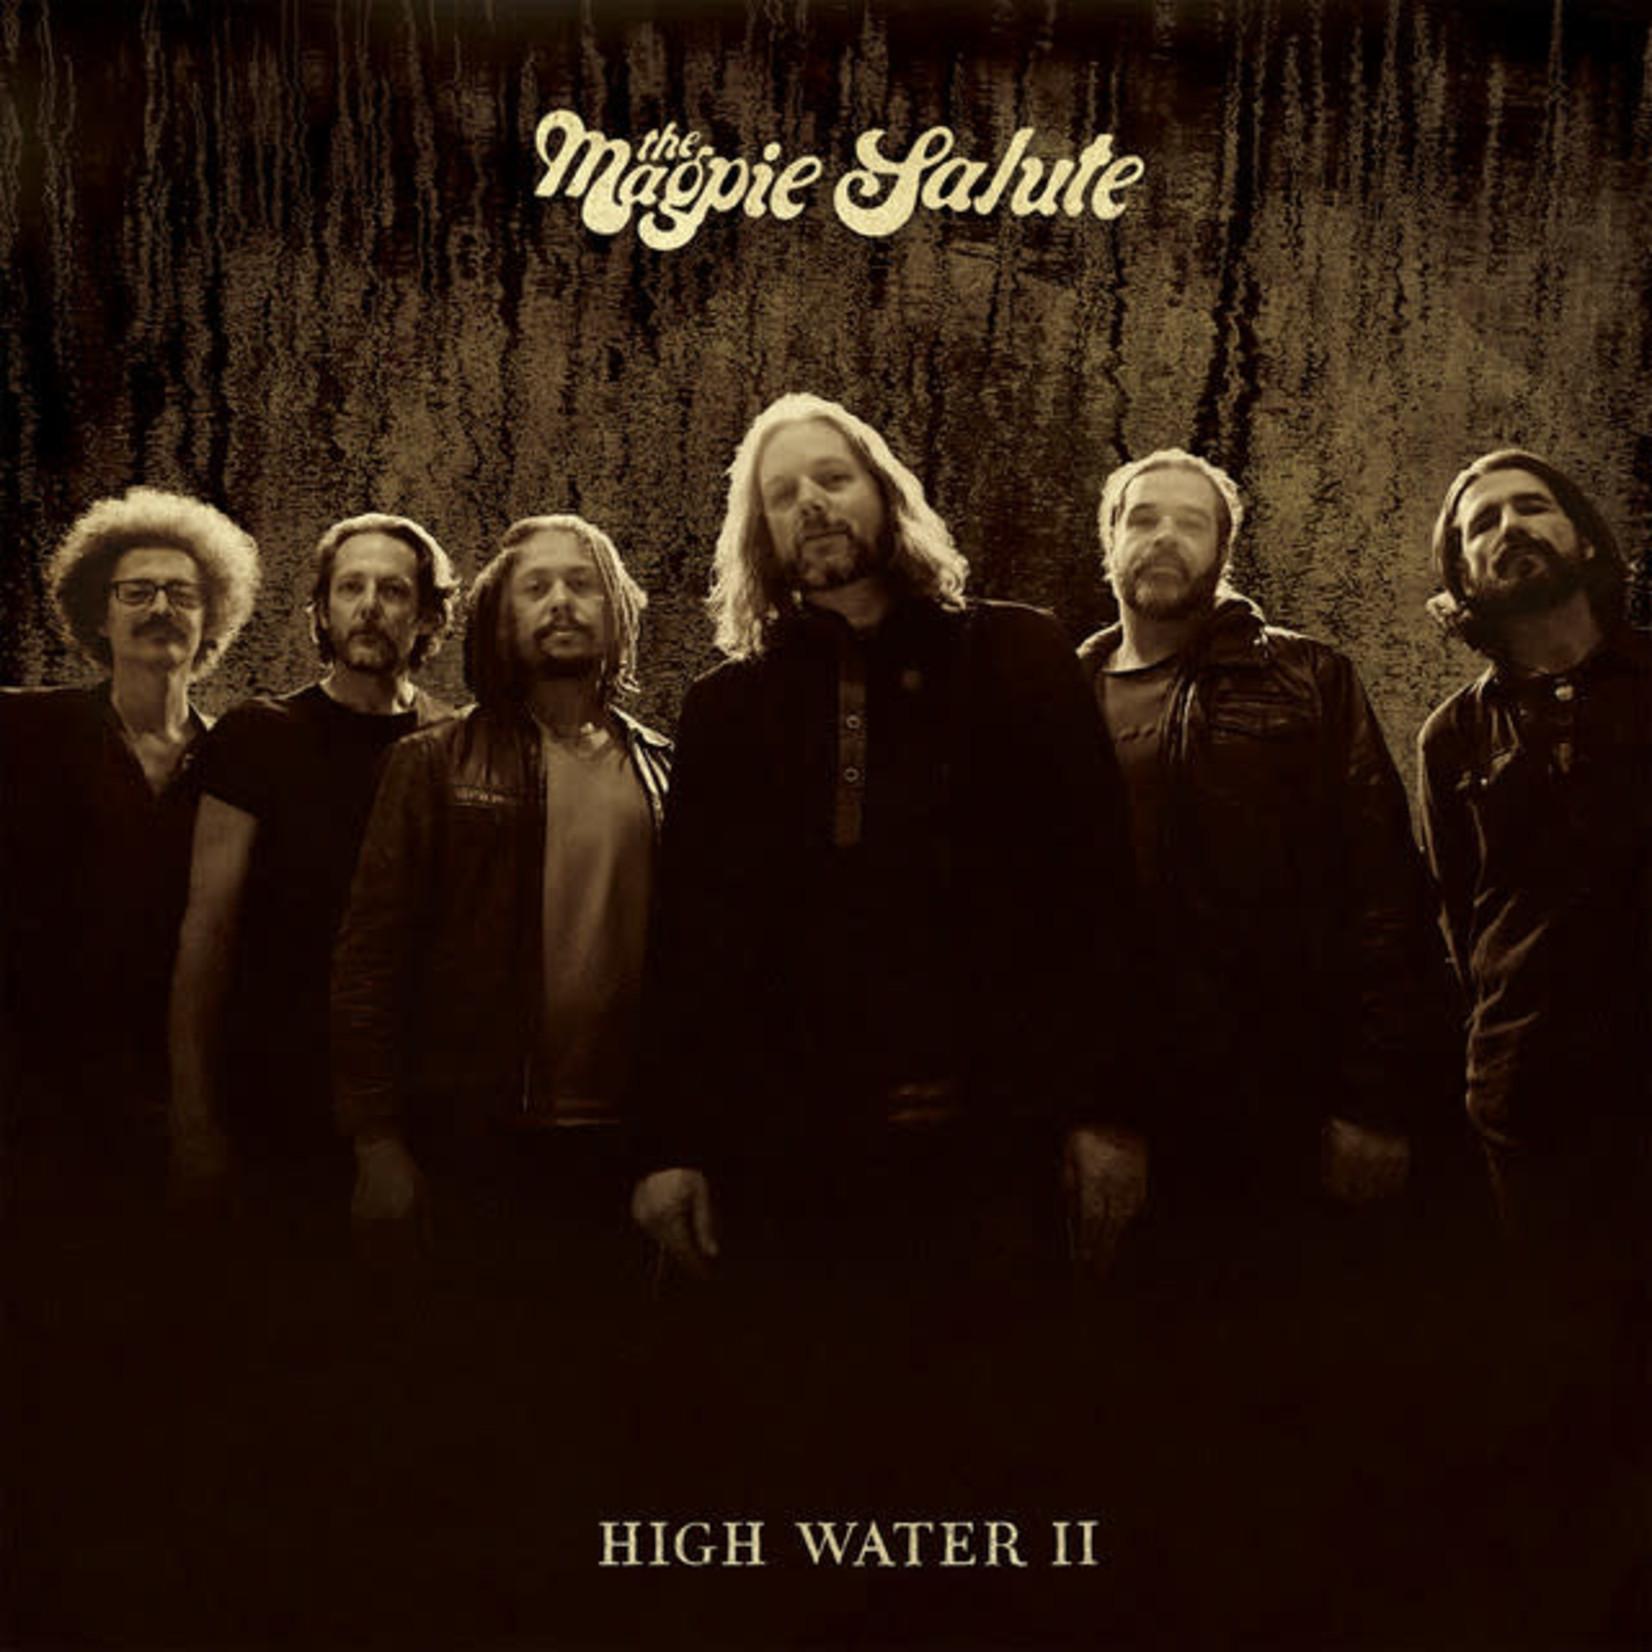 Vinyl The Magpie Salute - High Water II. $$